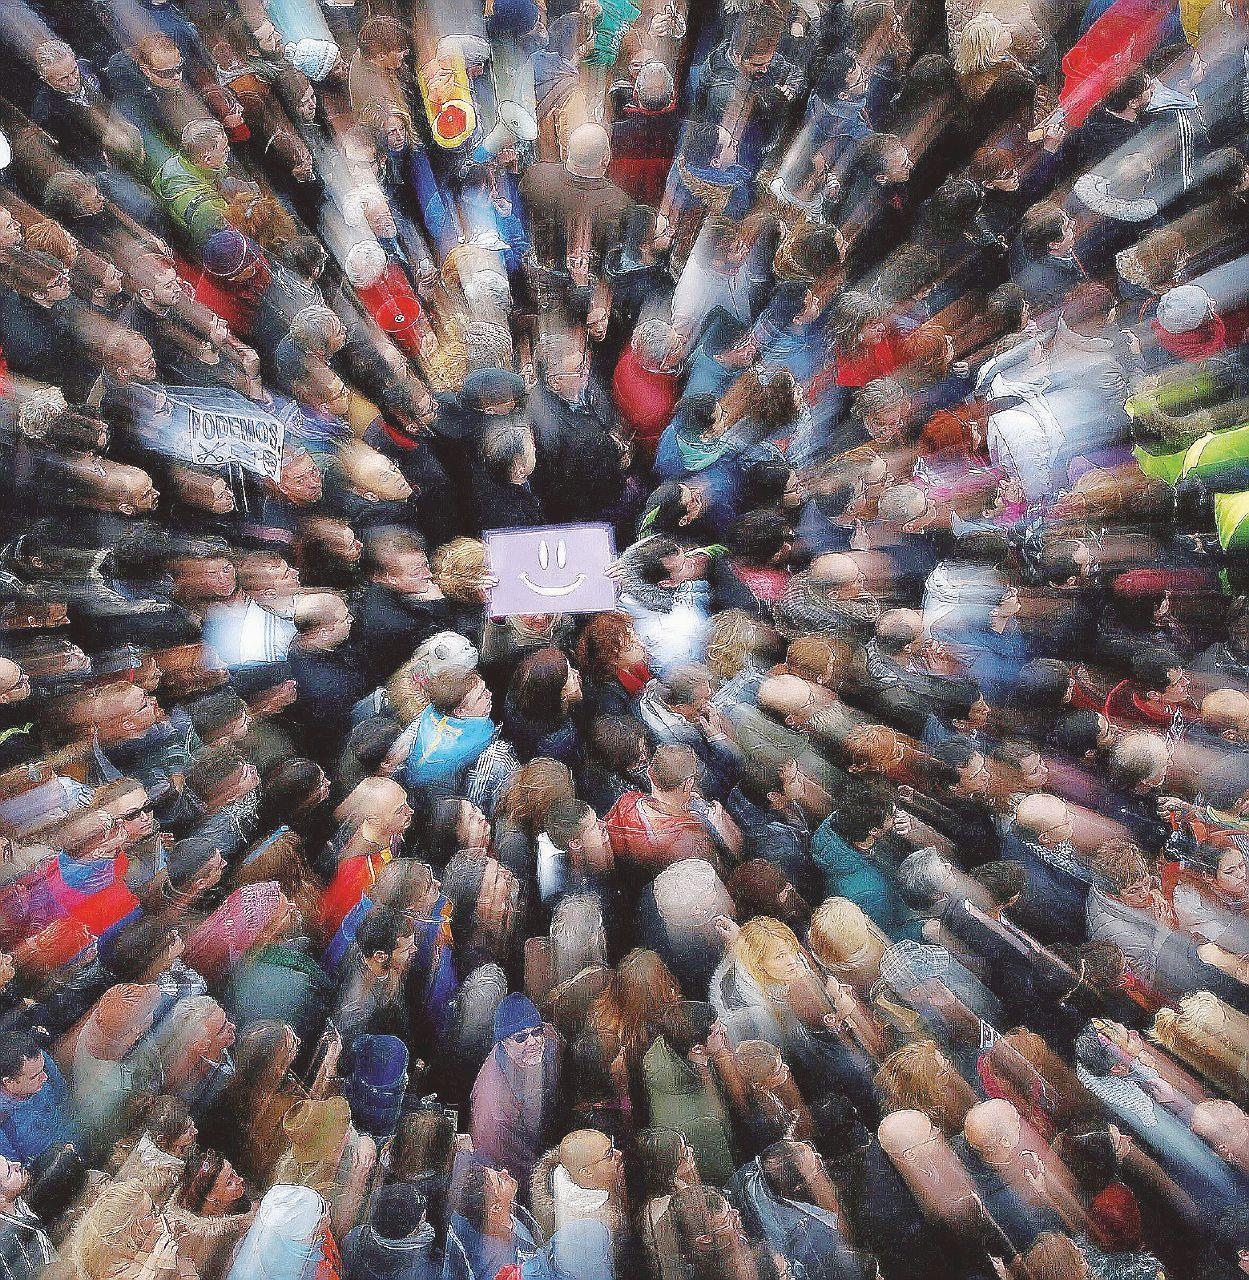 Non ne Podemos più Lite Errejon-Iglesias: c'eravamo tanto amati